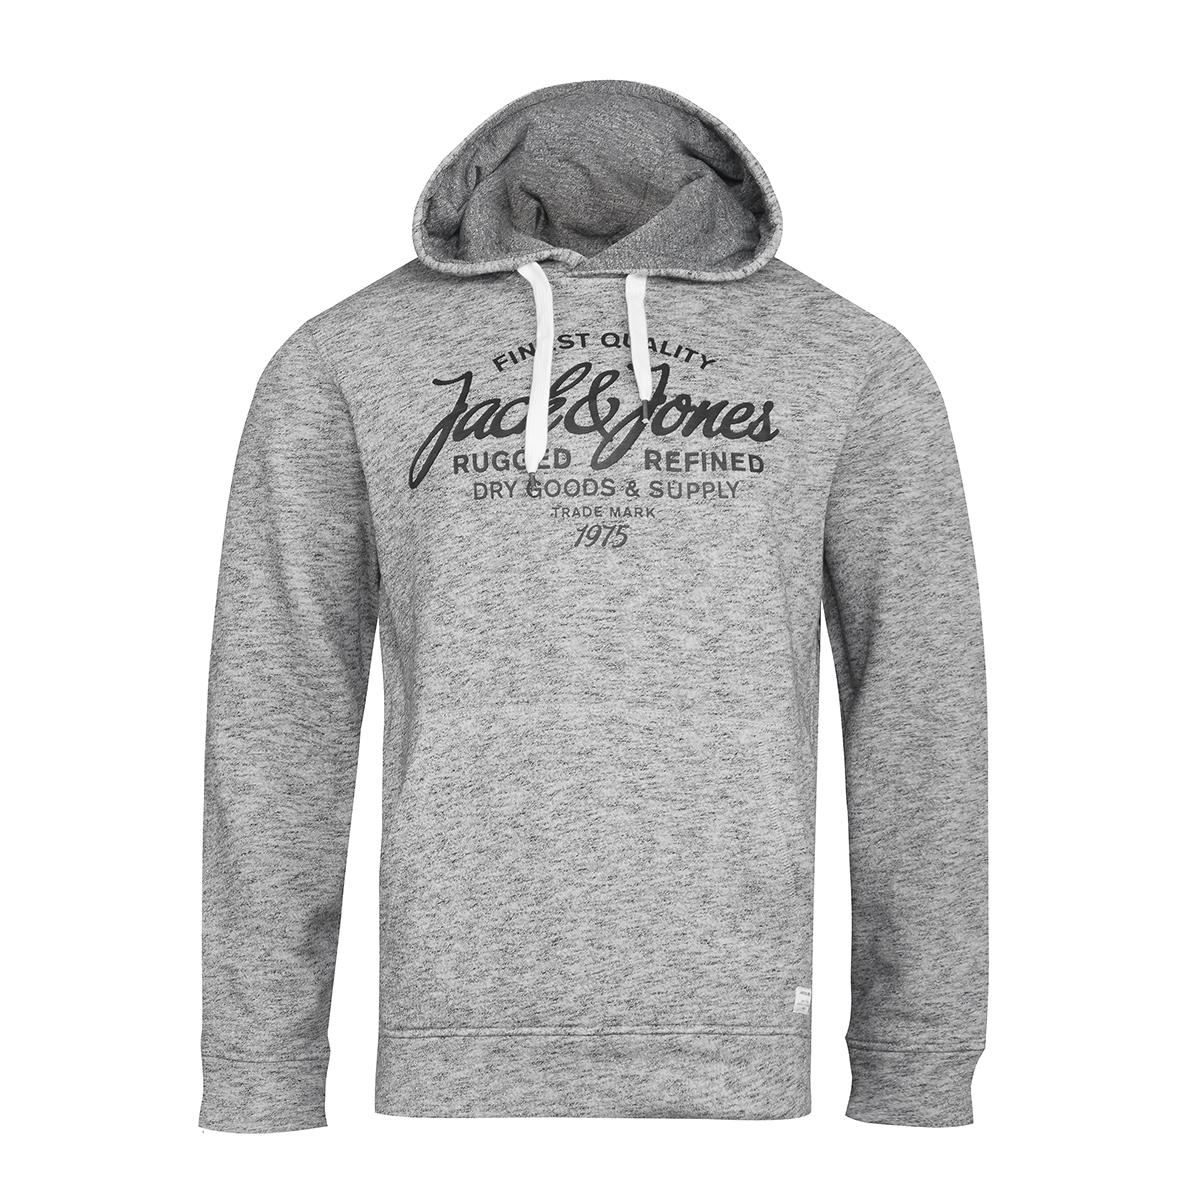 269932d959f4f5 Übergrößen Jack   Jones bedruckter Hoodie grau meliert